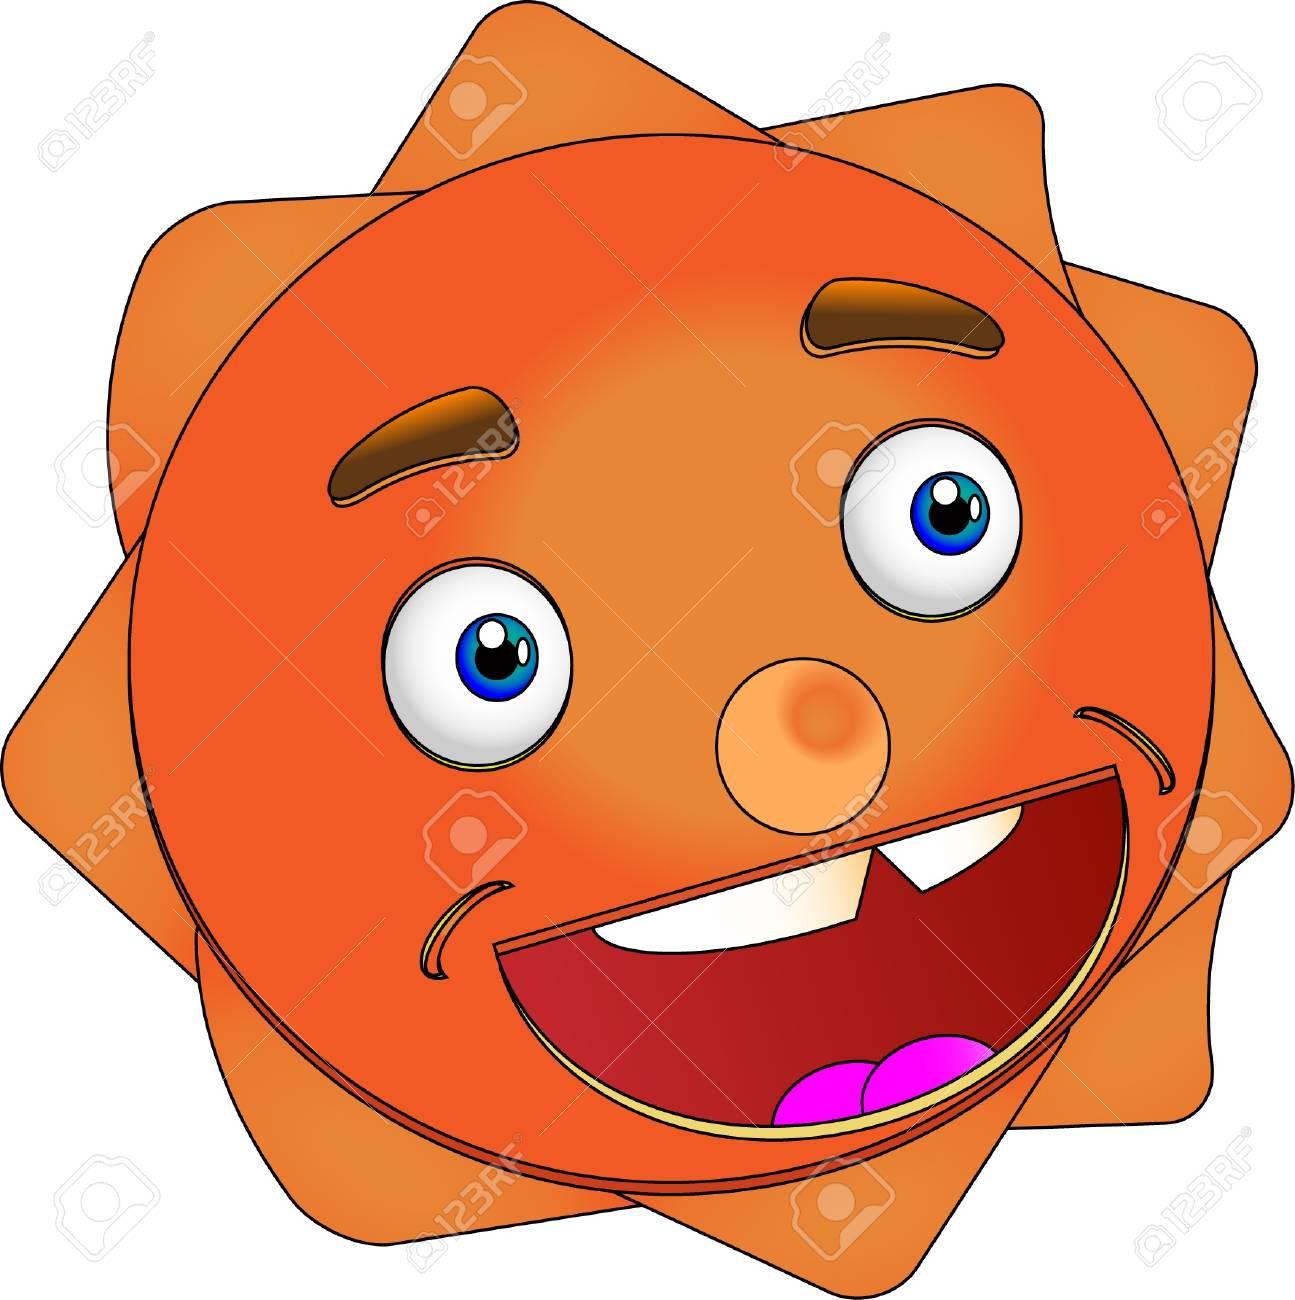 Smiling Sun Vector Illustration Stock Vector - 15897276